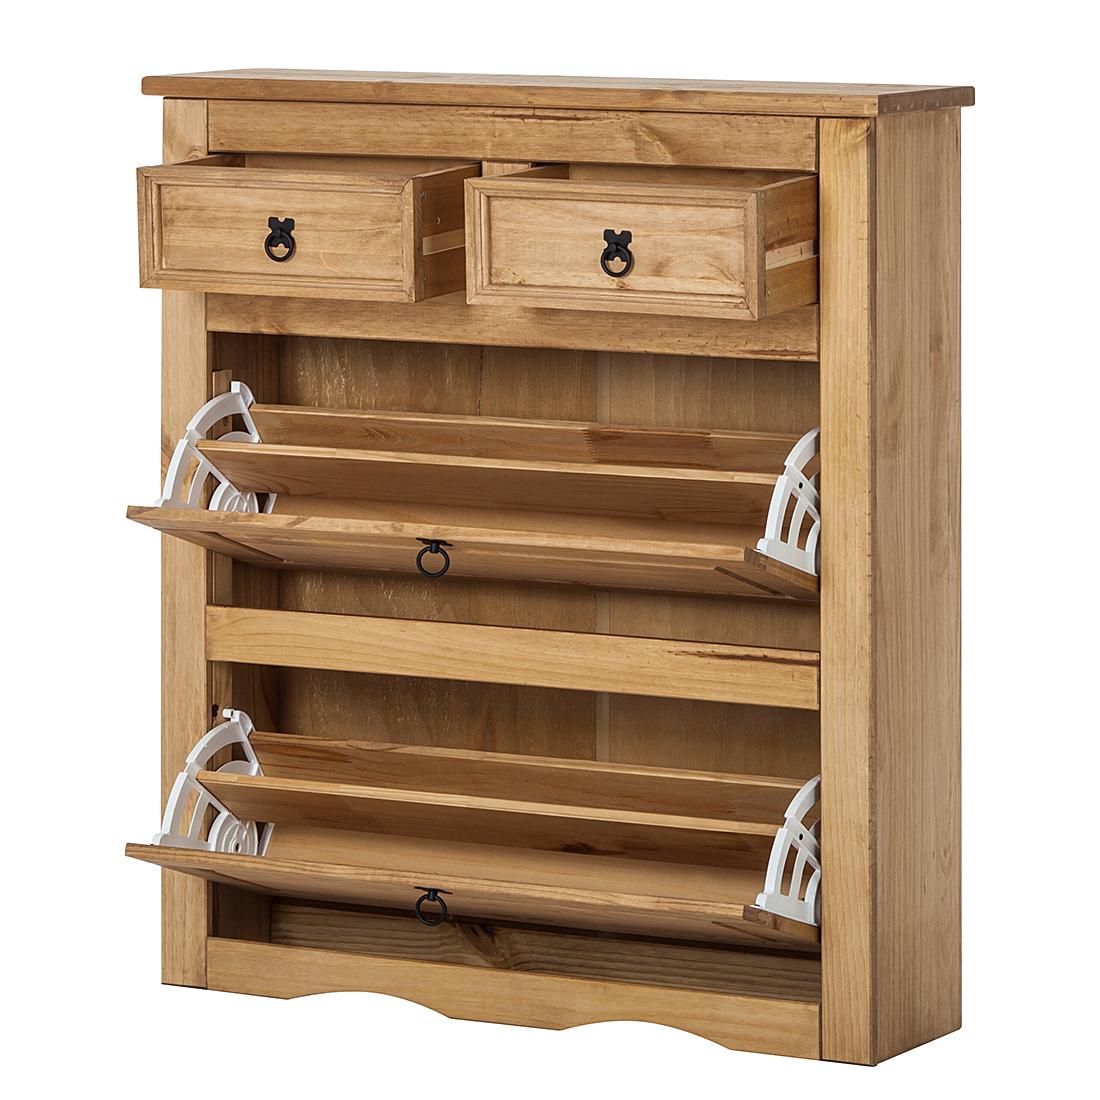 maison belfort schuhschrank finca rustica kiefer schuhkommode schuhkipper ebay. Black Bedroom Furniture Sets. Home Design Ideas